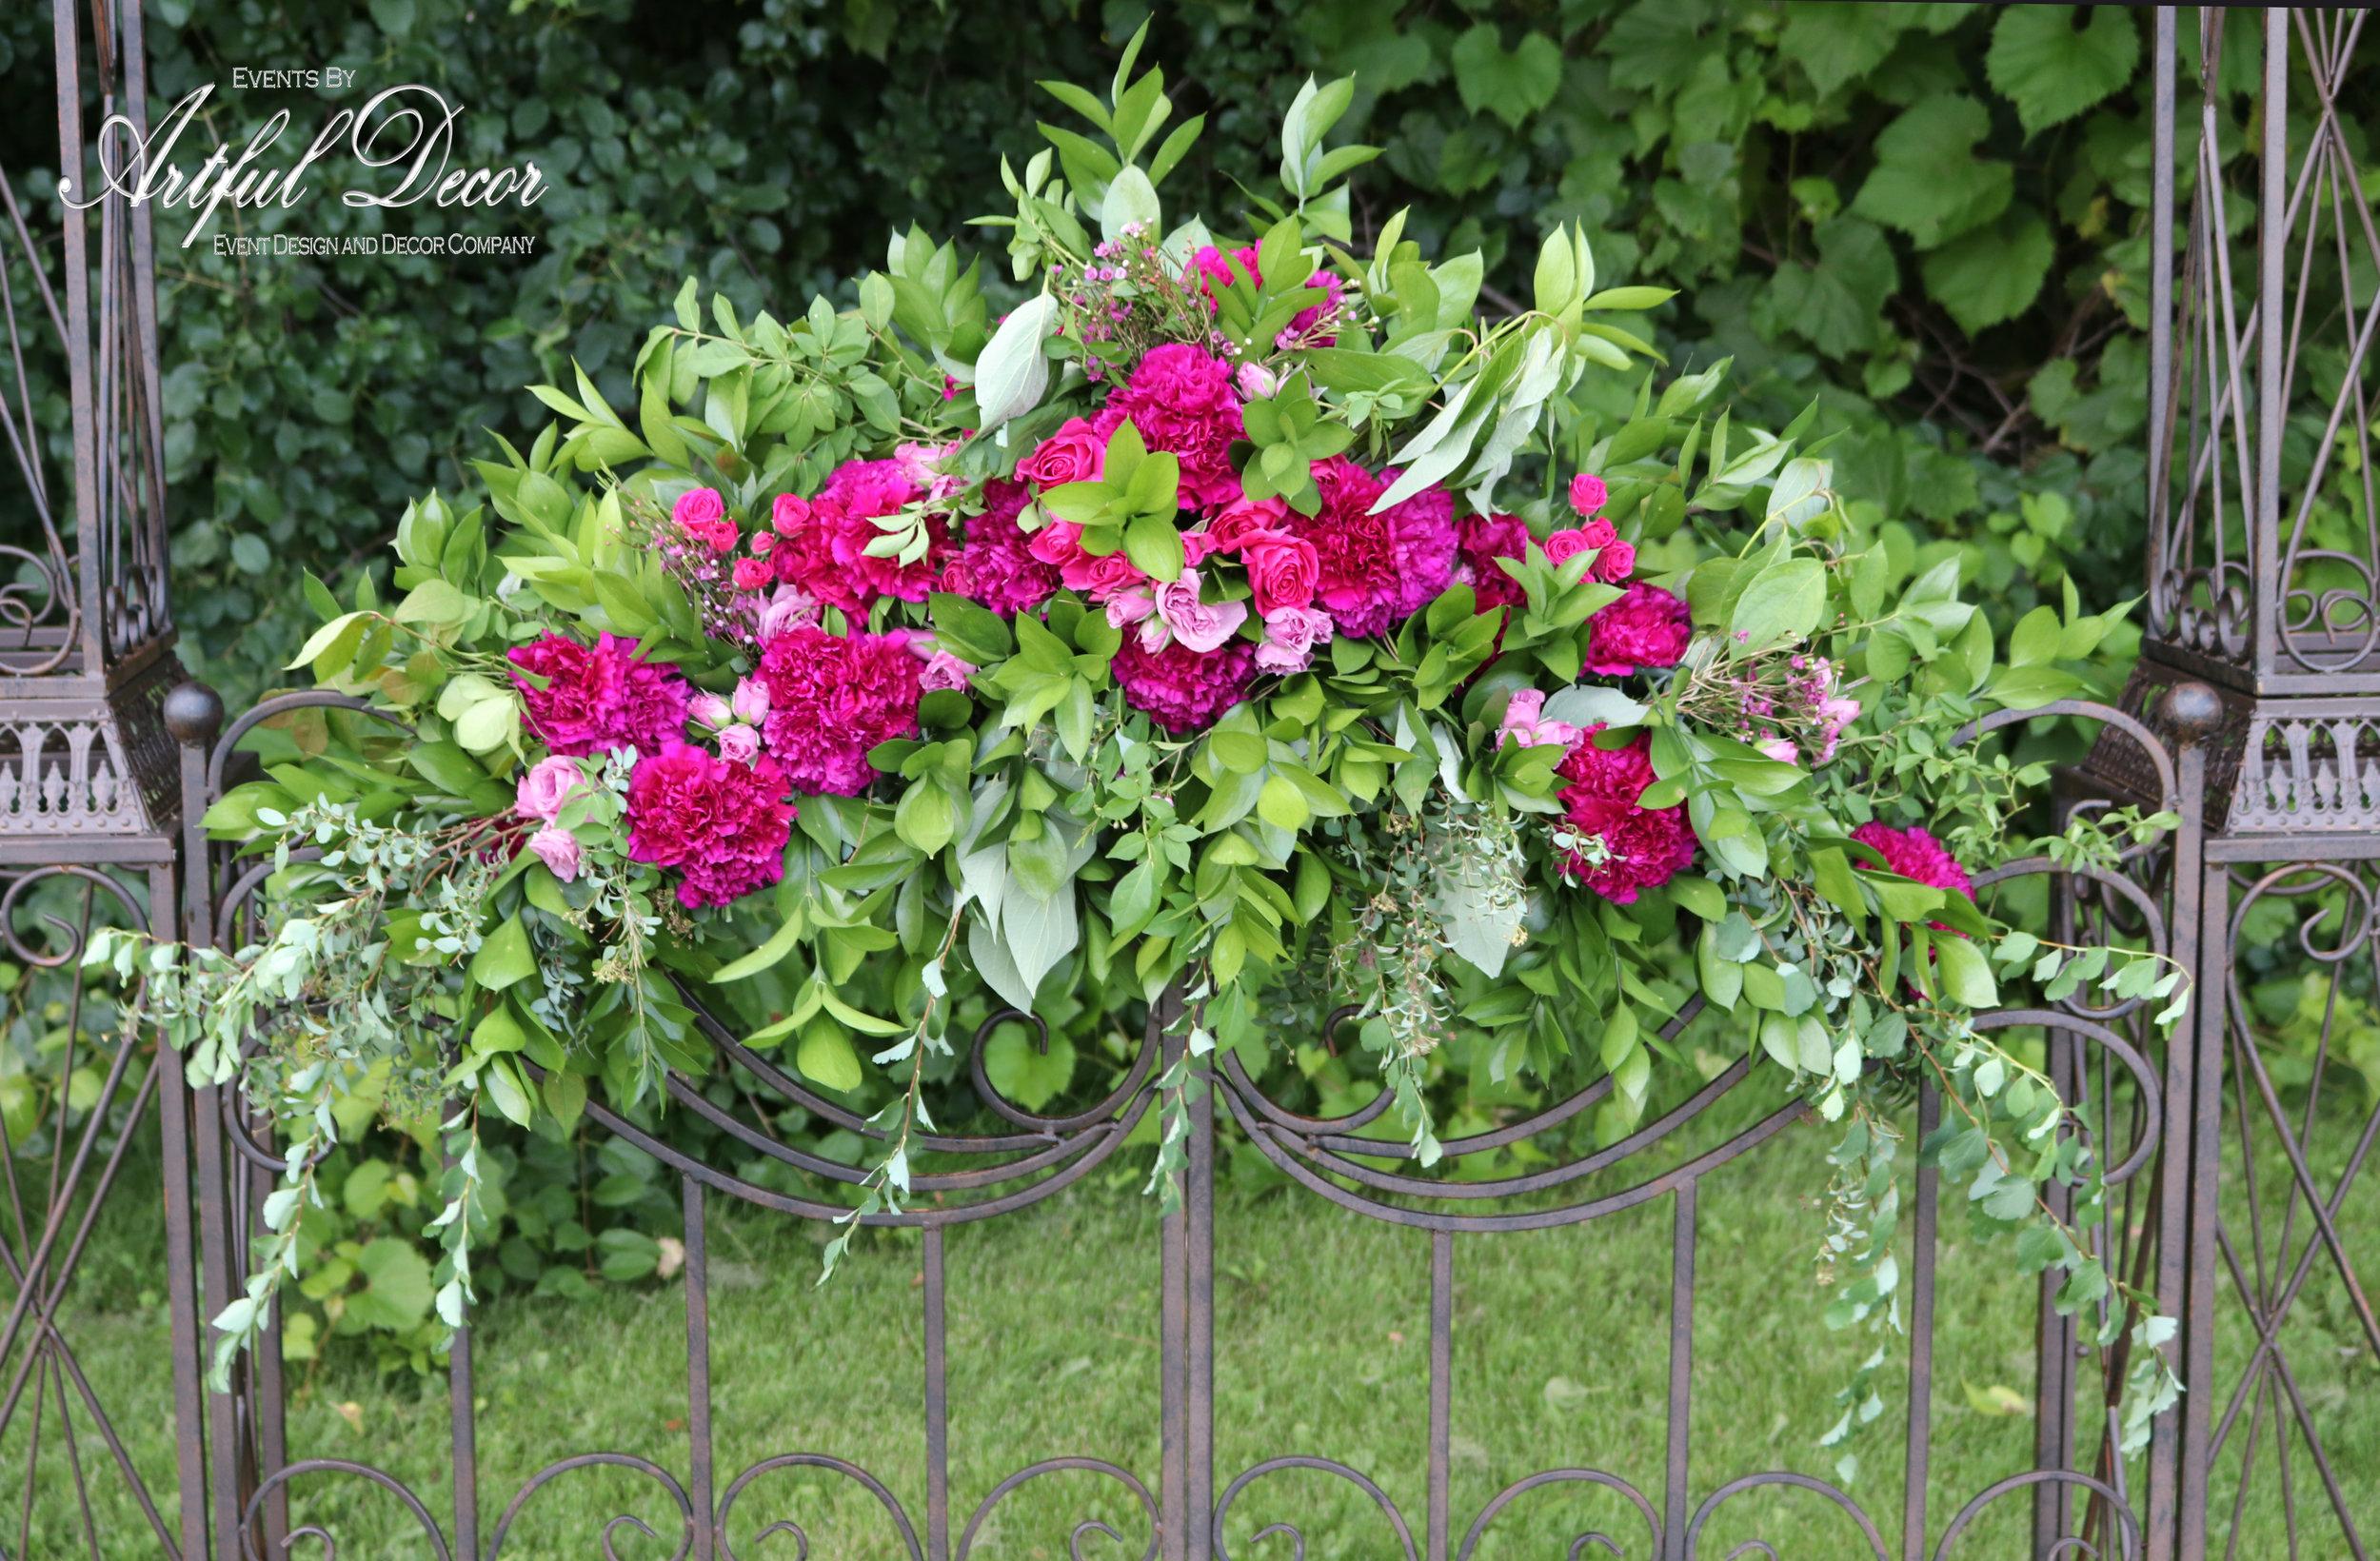 Garden Gate 18 Copyright.jpg